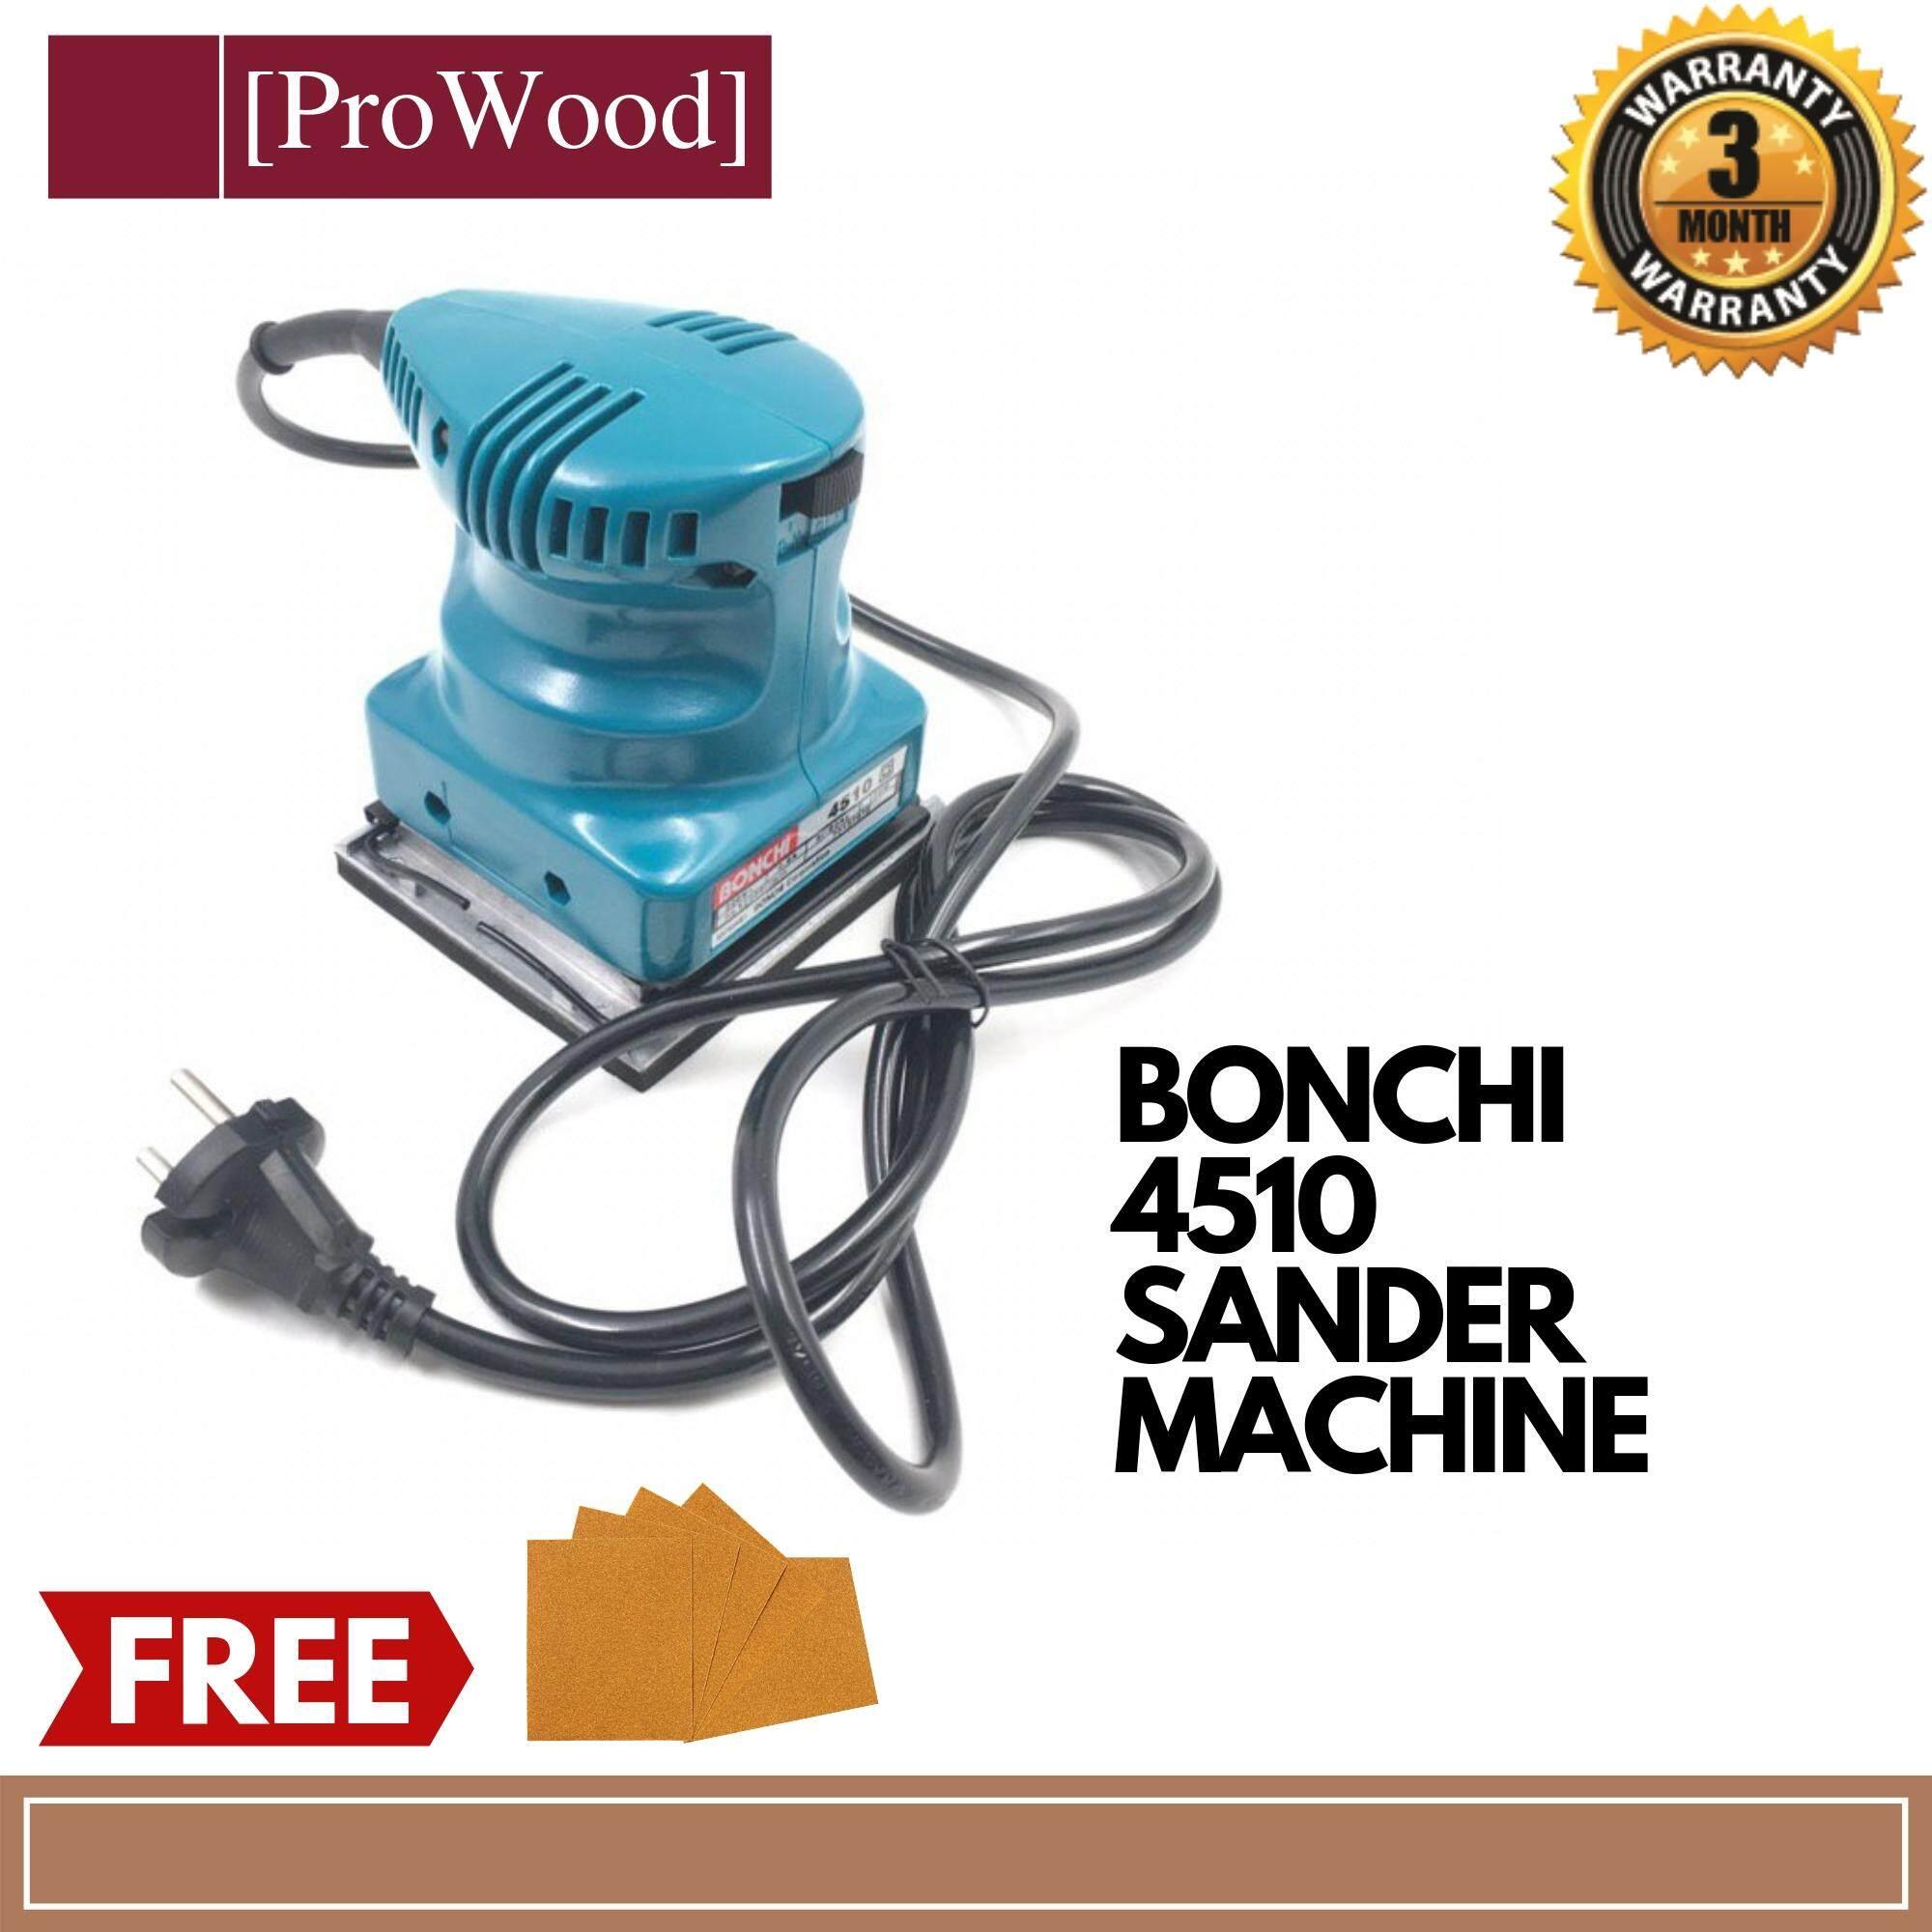 BONCHI 4510 Sander Machine Electric Sander Woodworking Sanding Tools Finishing Makita Style FOC 5pcs Sandpaper